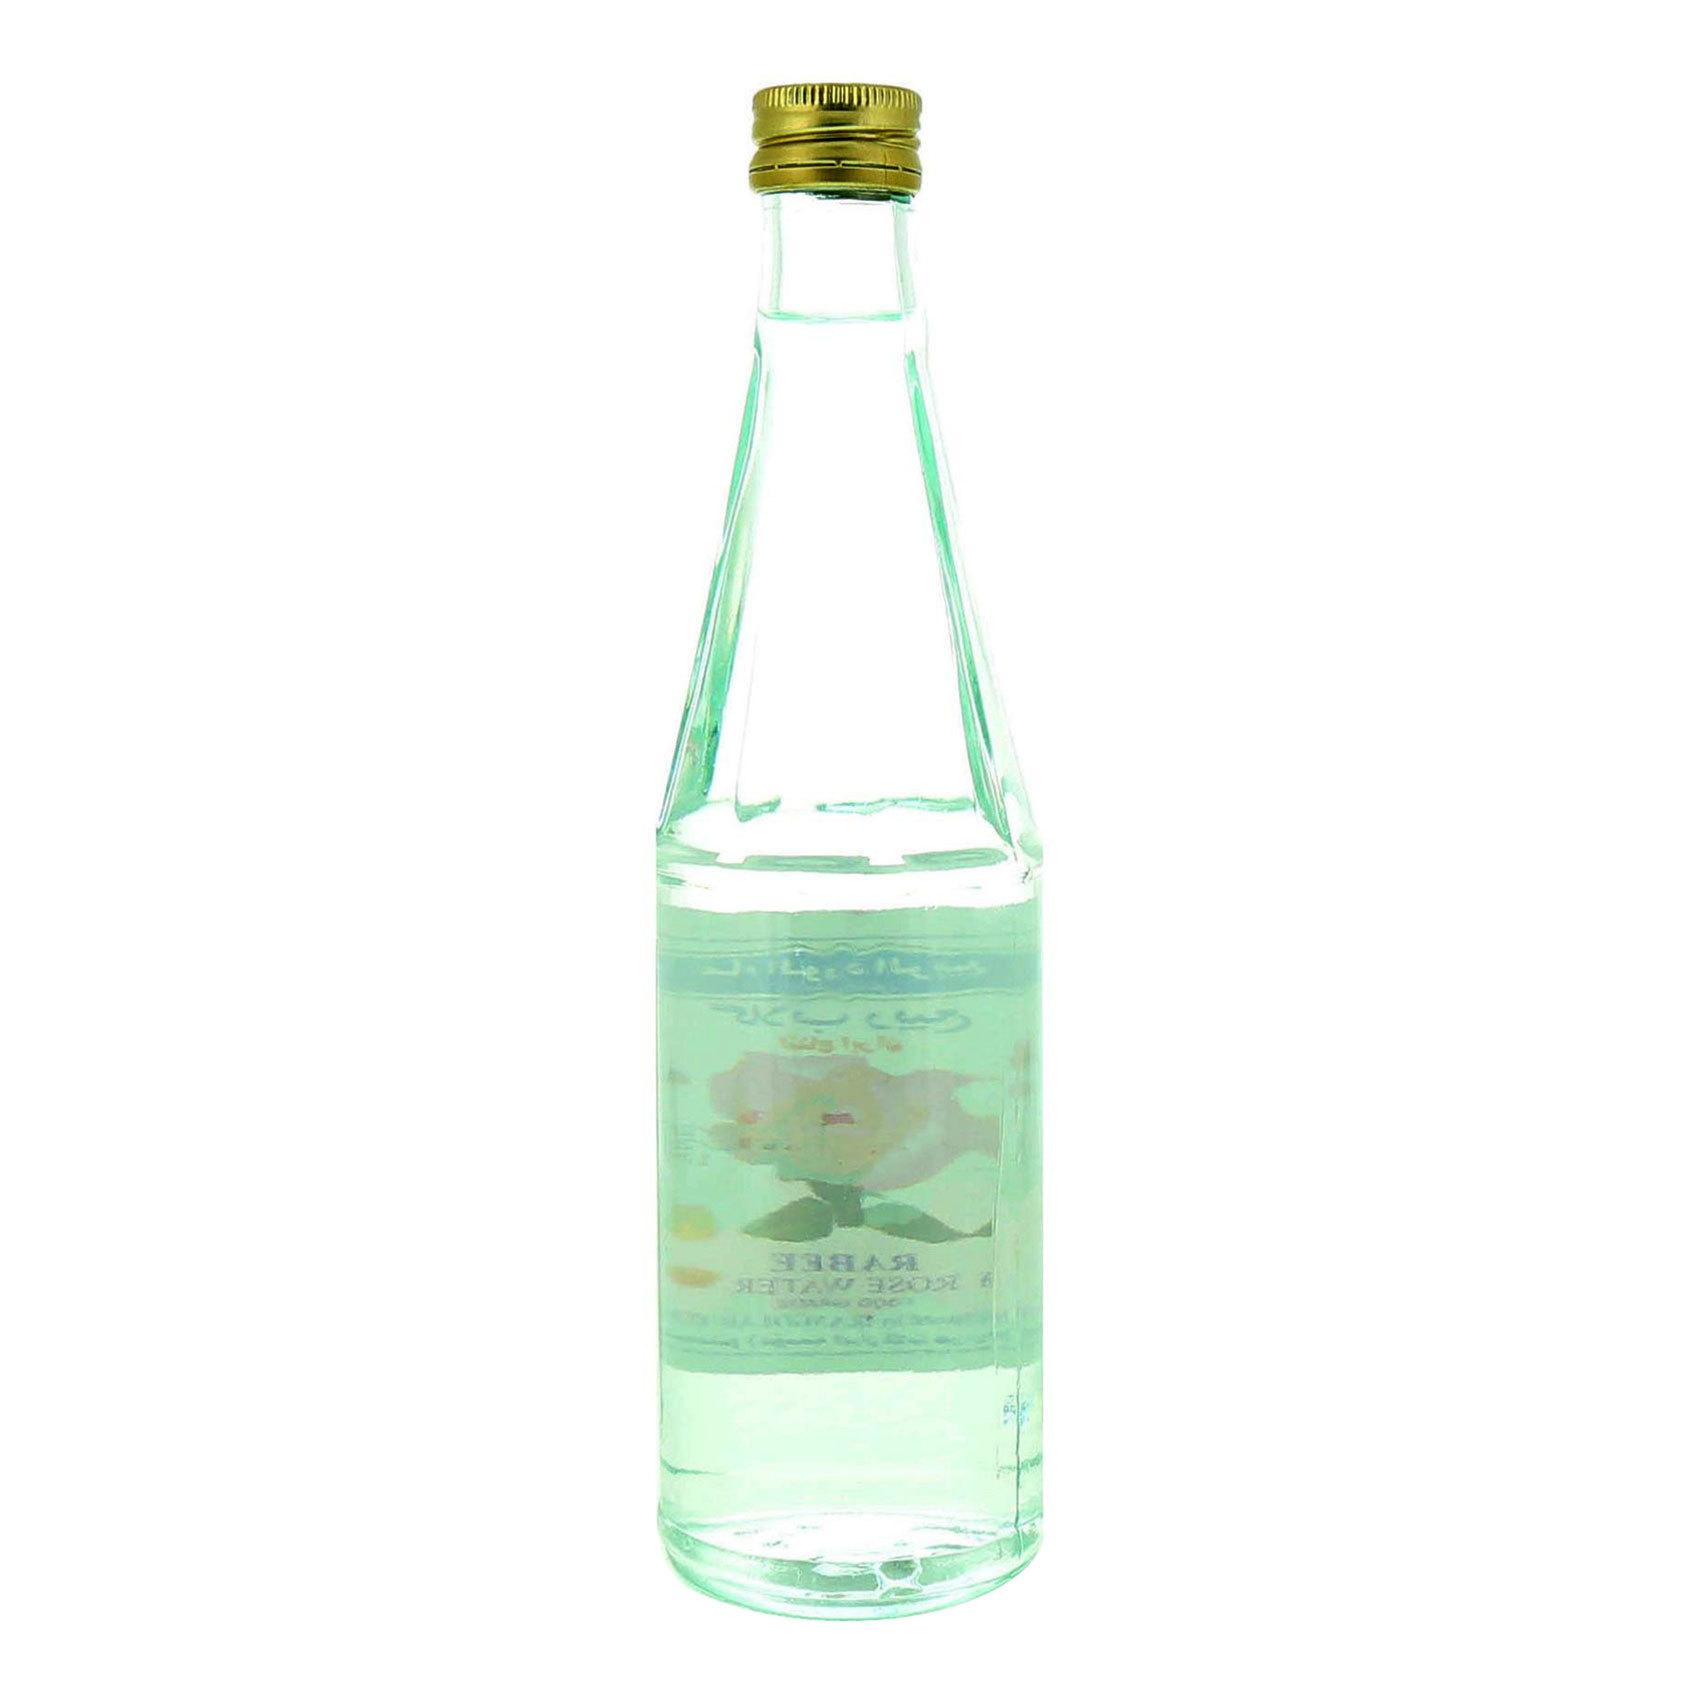 RABEE ROSE WATER 430ML